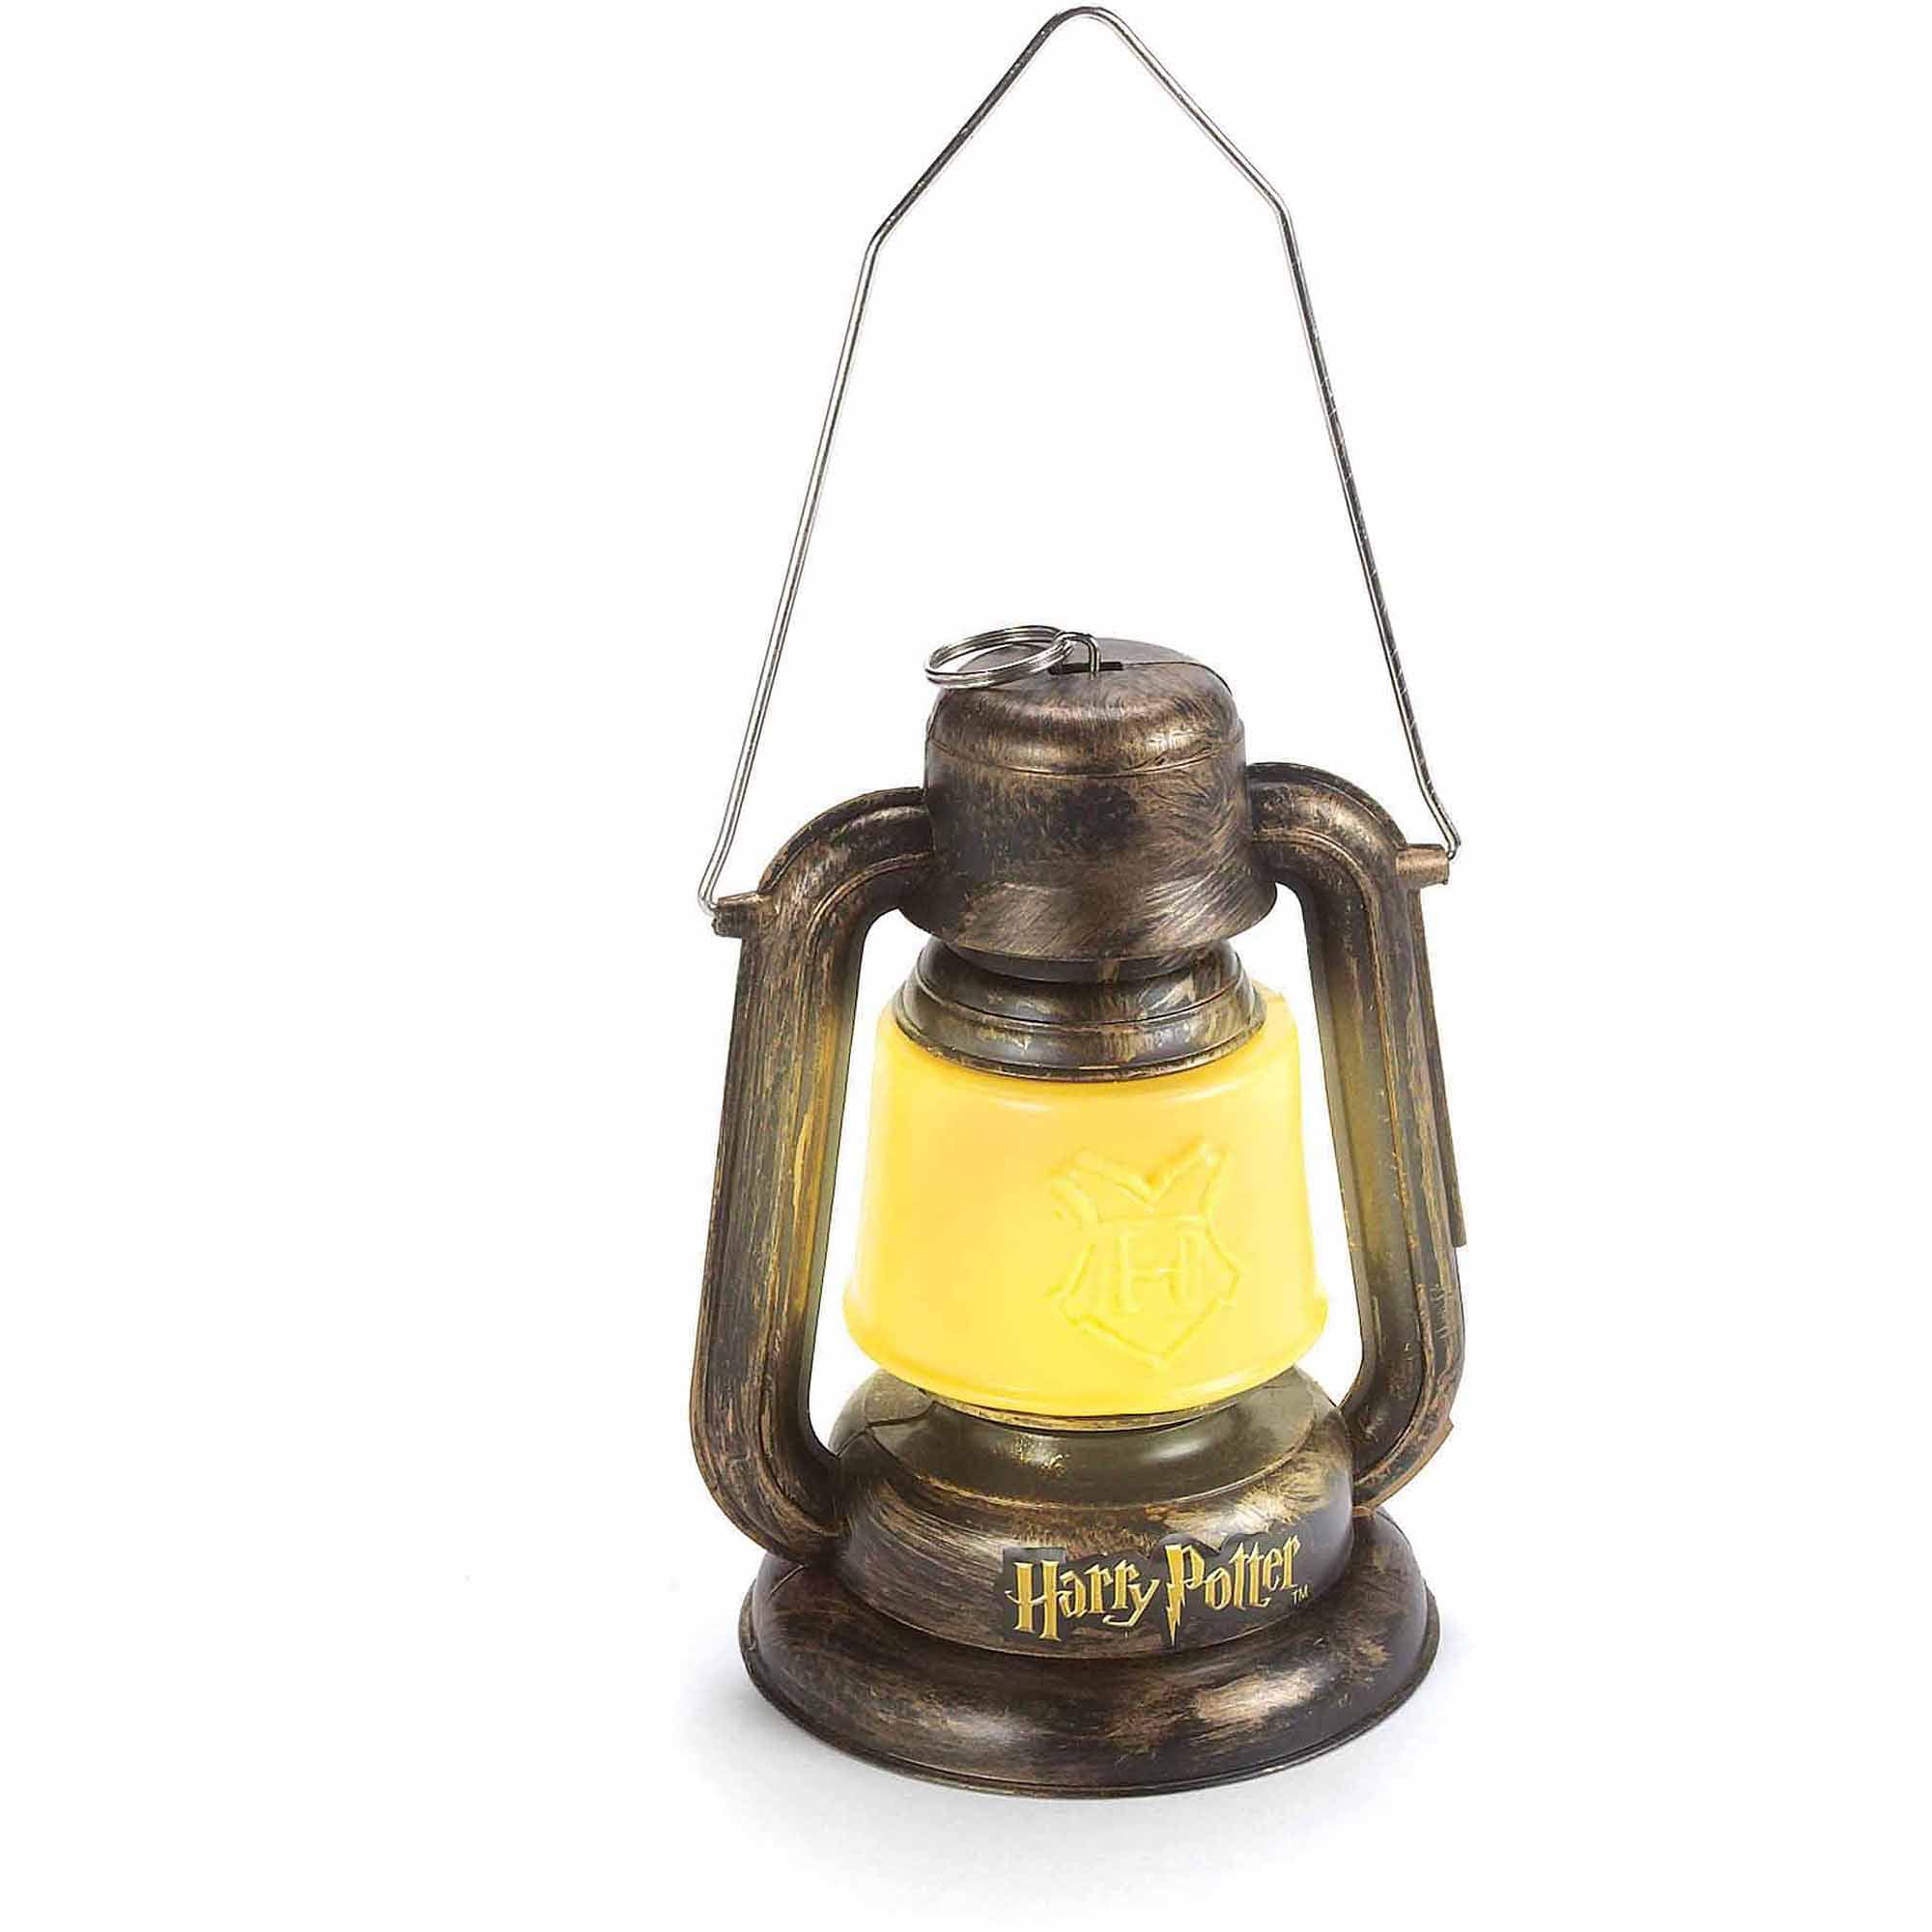 Harry Potter Lantern Adult Halloween Accessory